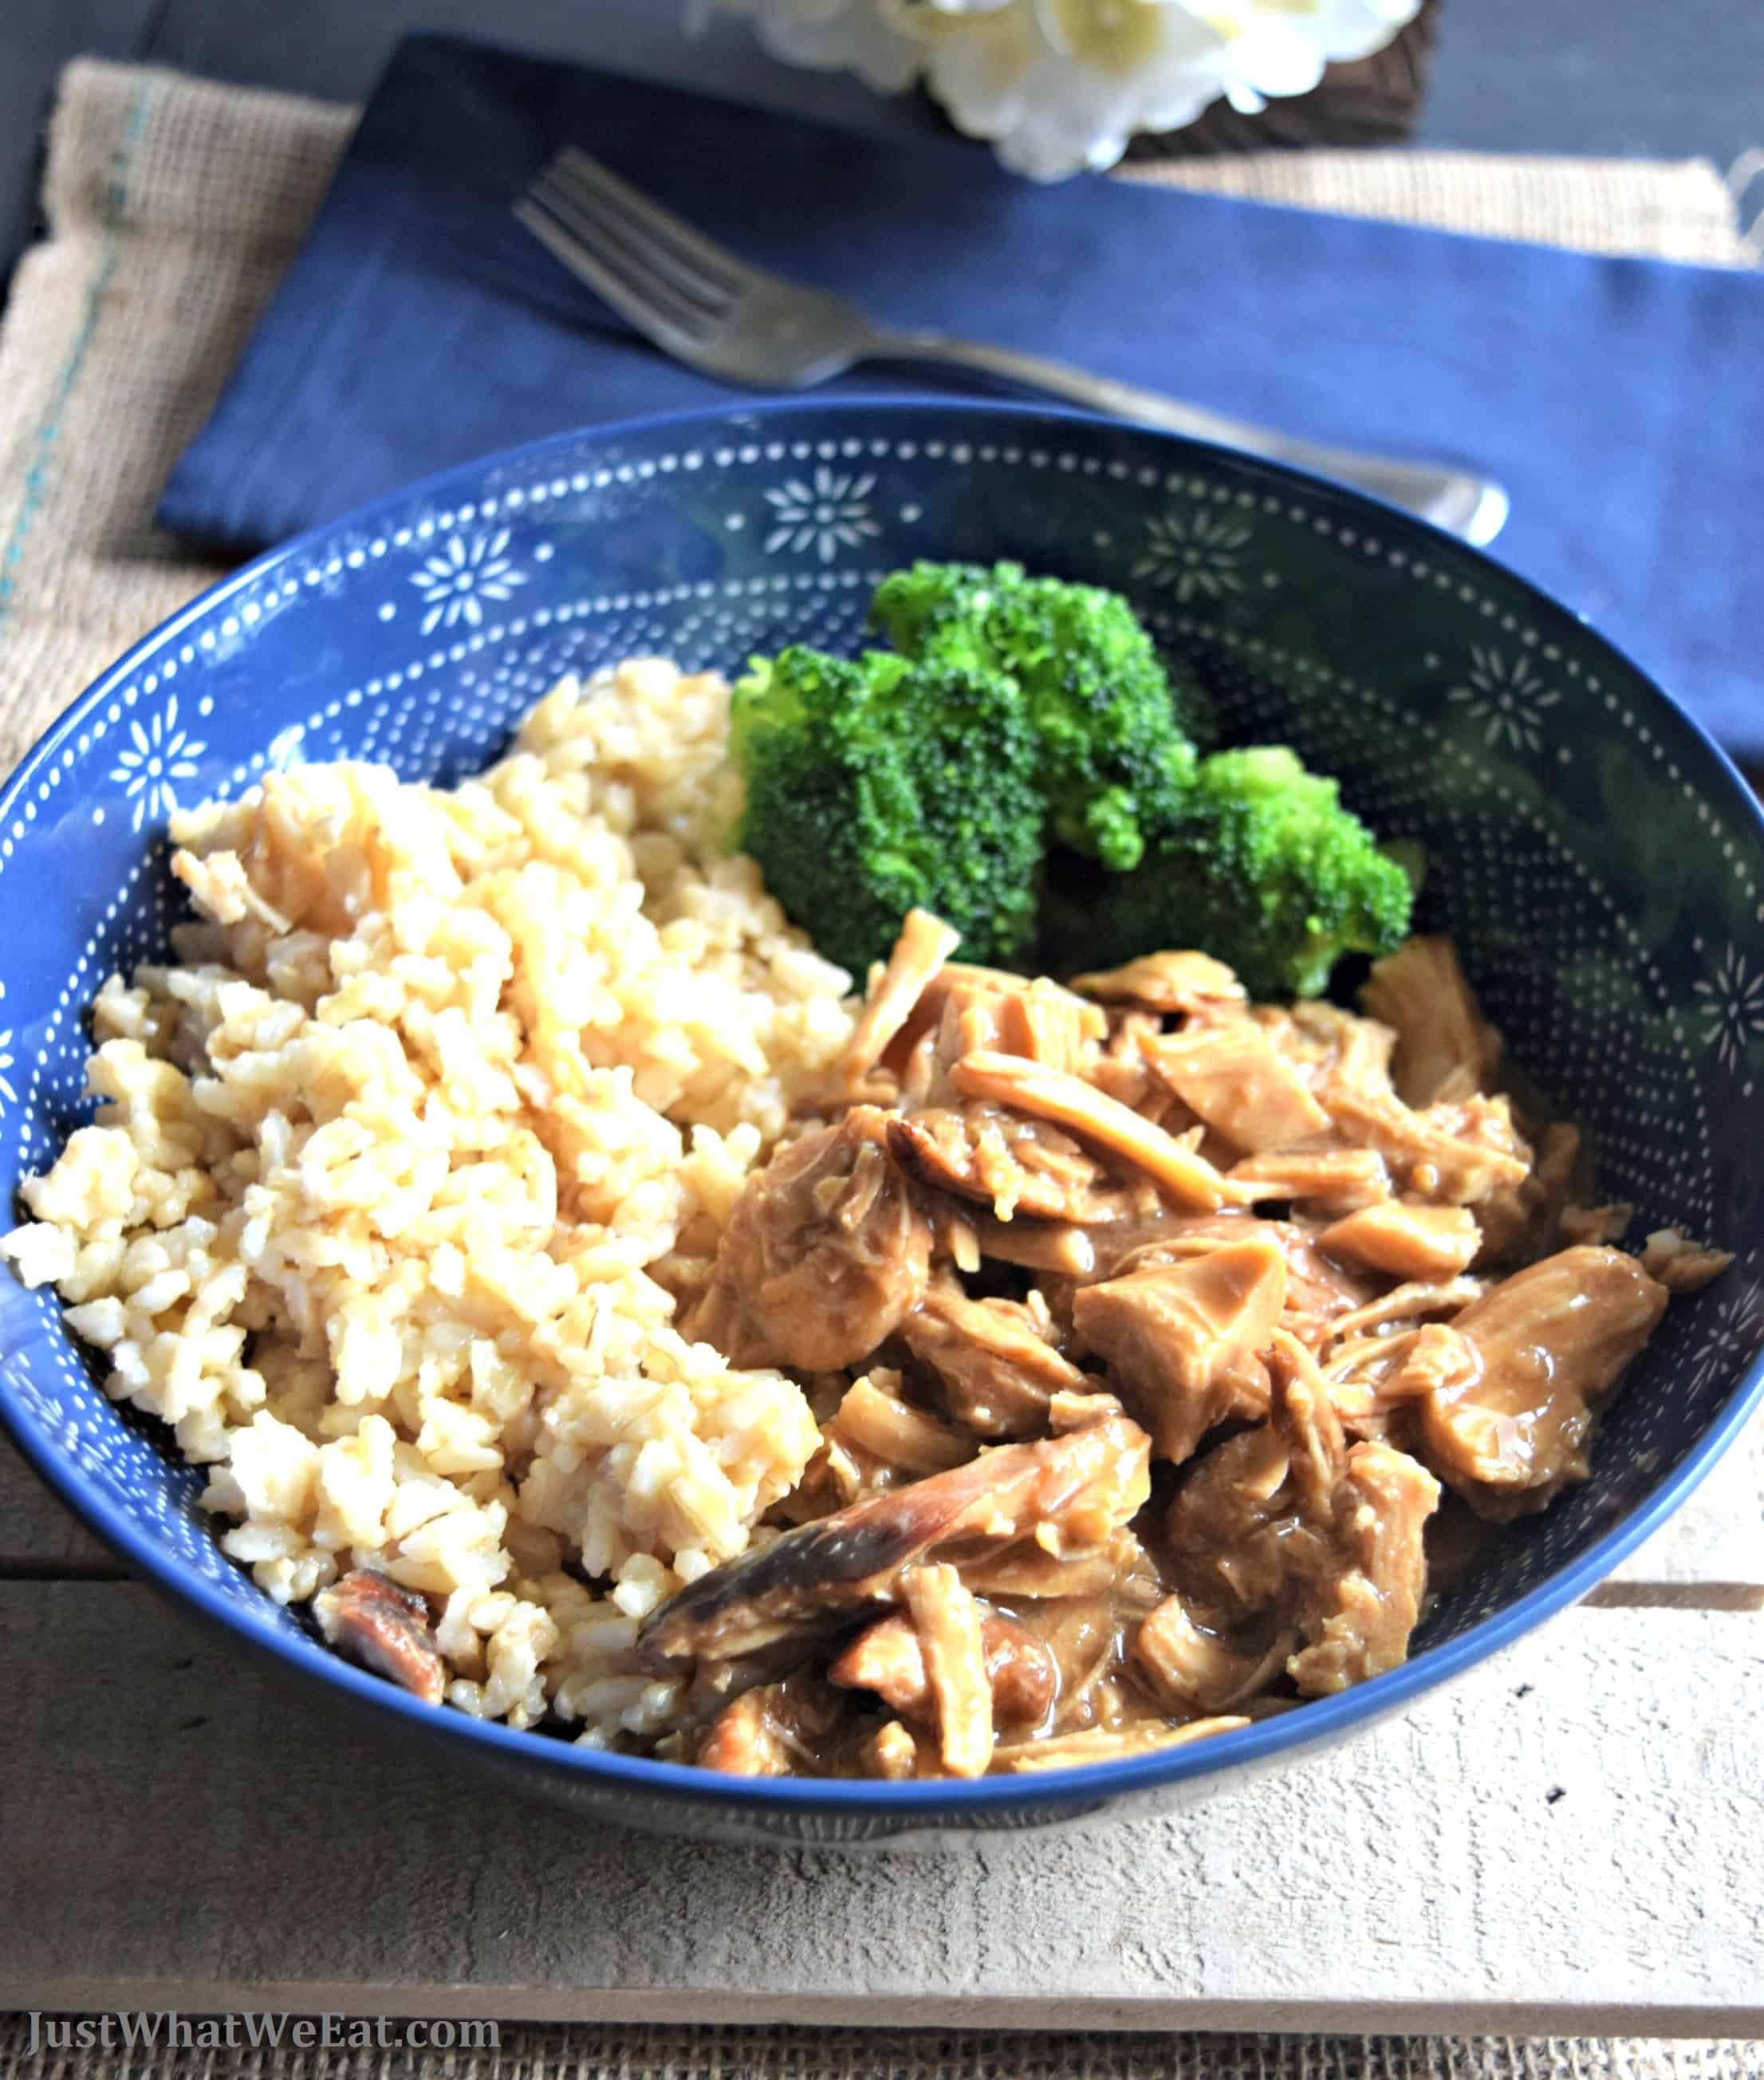 Teriyaki Chicken - Gluten Free, Dairy Free, & Soy Free